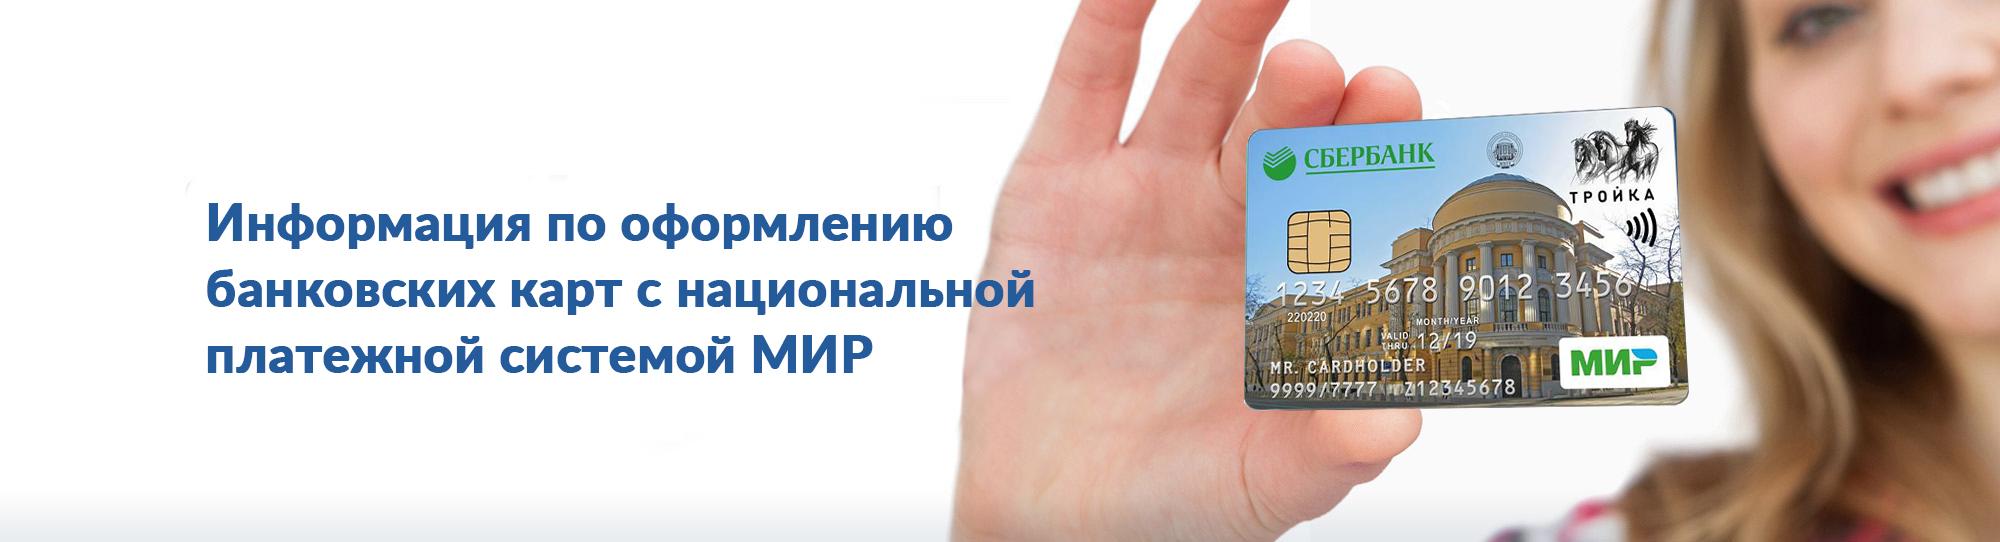 mpgu-site-big-banner-Kampus-karty